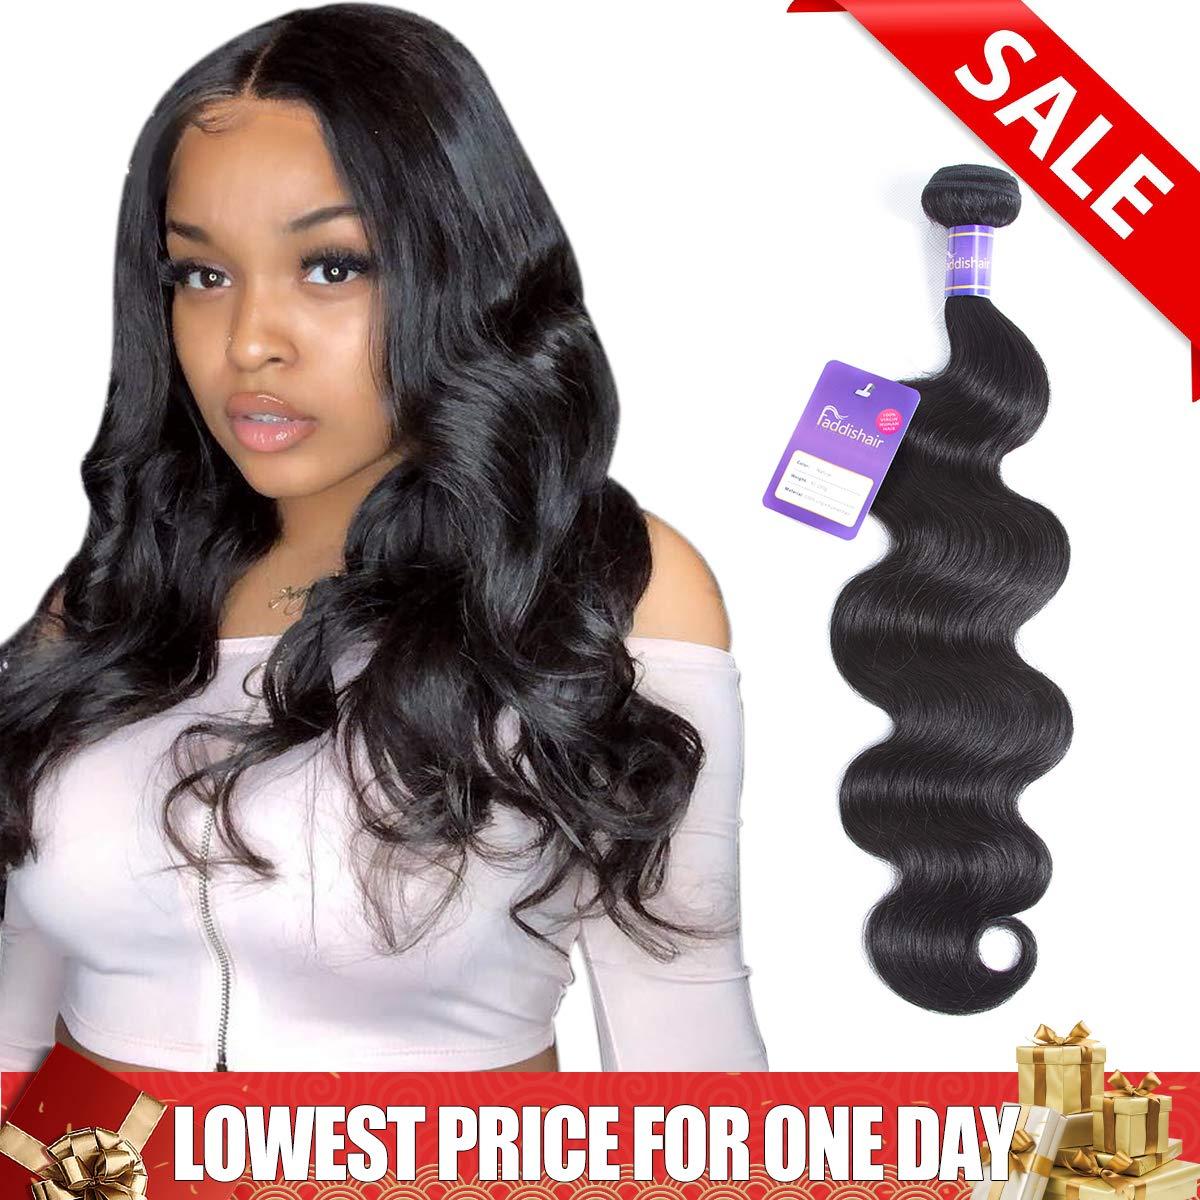 Faddishair Human Hair Bundles Body Wave One Bundles 12 Inch Brazilian  Virgin Hair 100% Unprocessed 9c2b4389553e